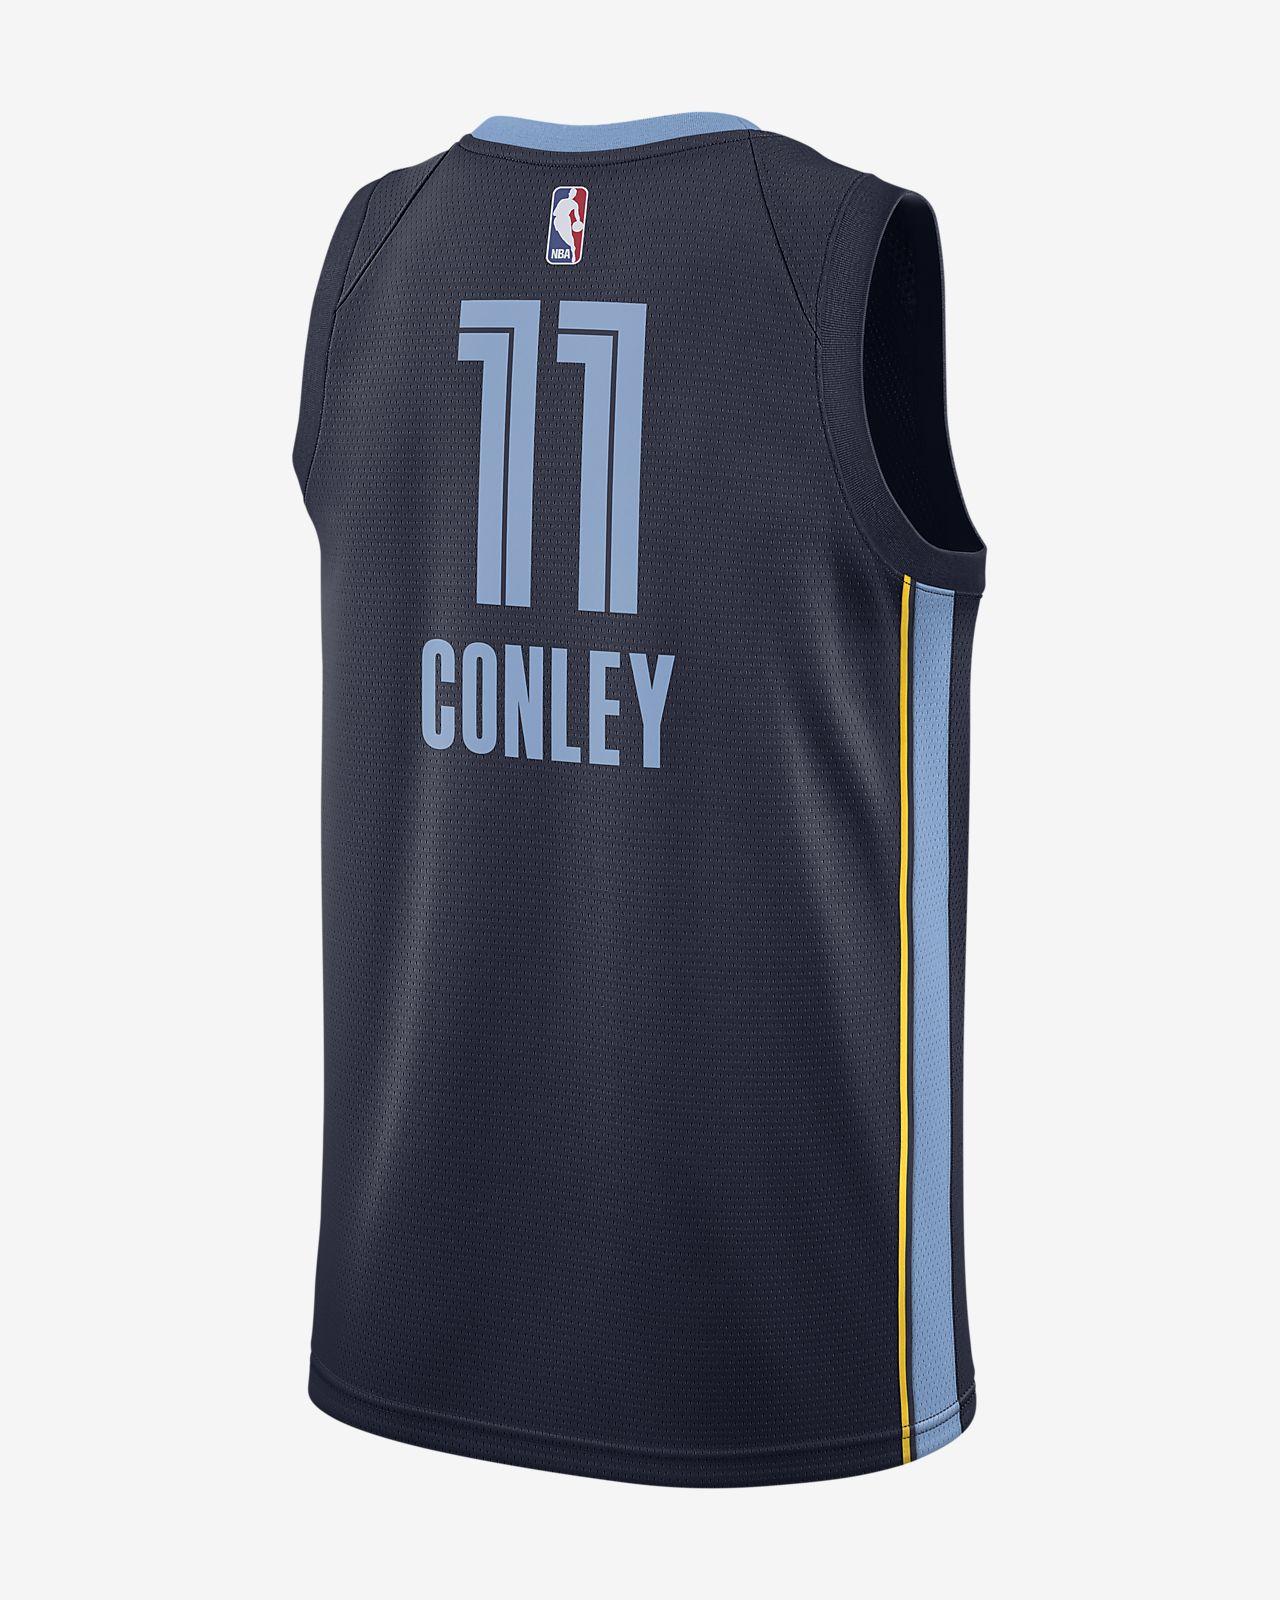 9f1dd060b ... Mike Conley Icon Edition Swingman (Memphis Grizzlies) Men s Nike NBA  Connected Jersey